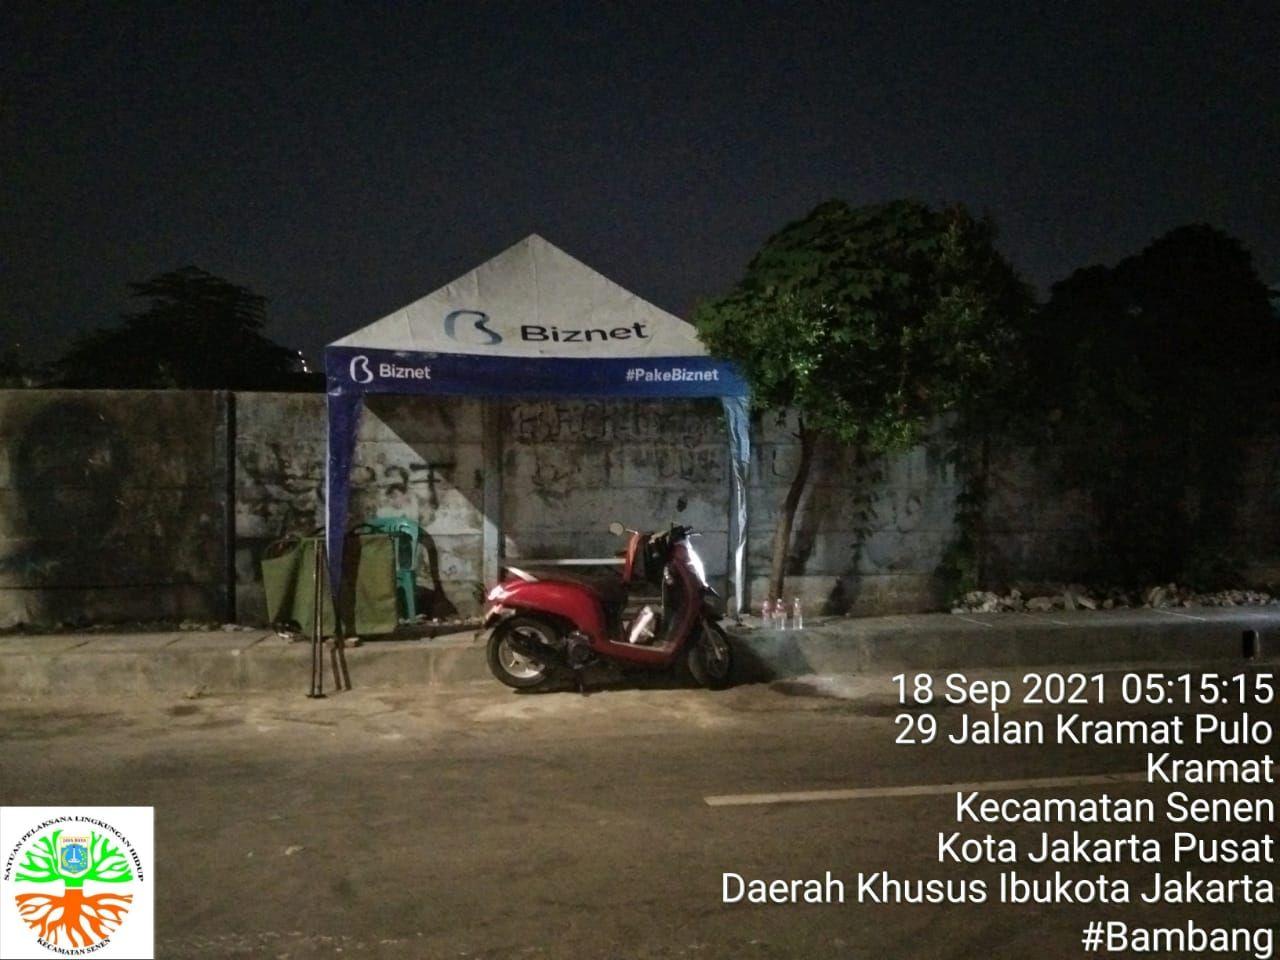 Penanganan dan penjagaan Jl Kenanga di Kramat, Jakpus, dari sampah. (Dok Pemkot Jakpus)